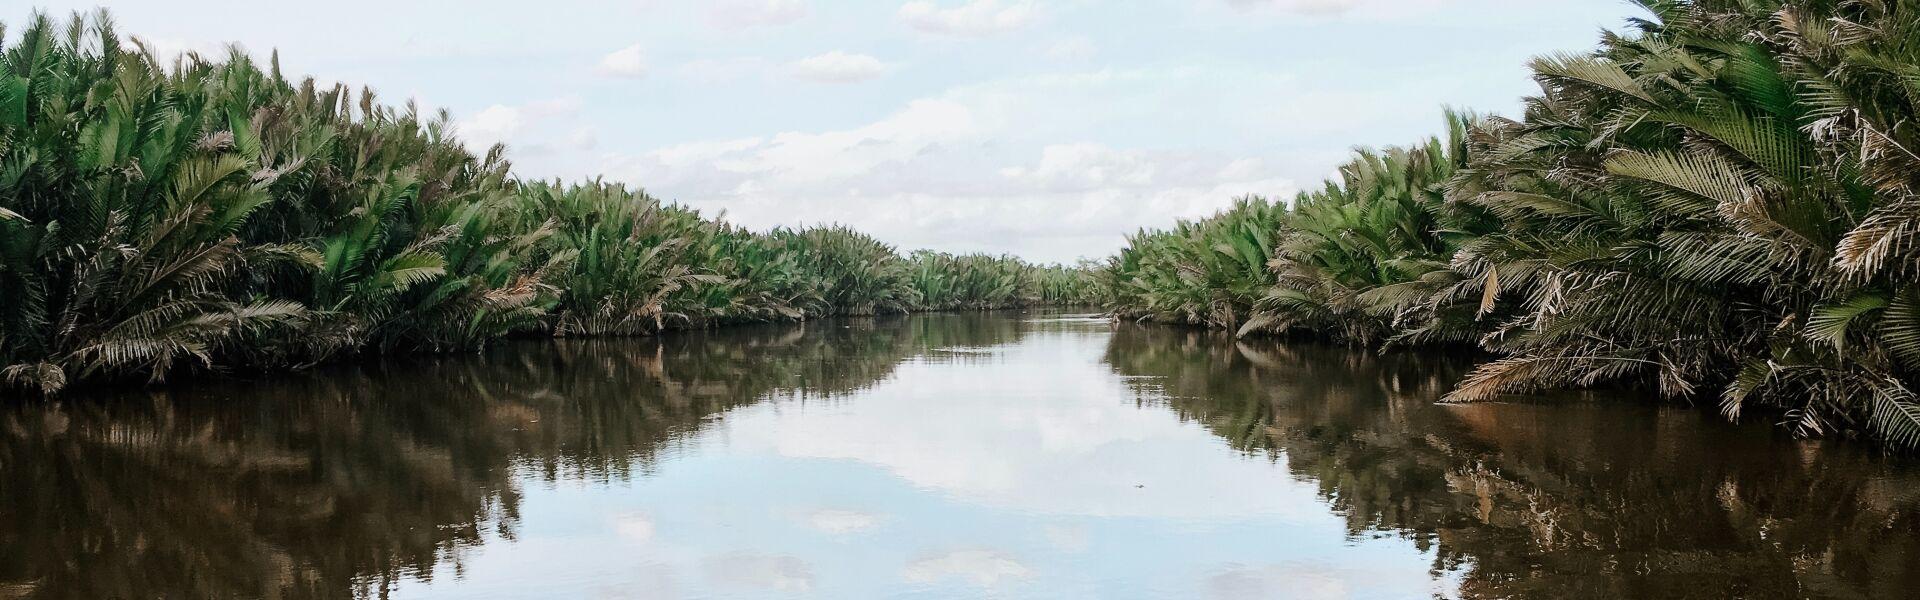 Kalimantan, Indonesia Holidays with Selective Asia